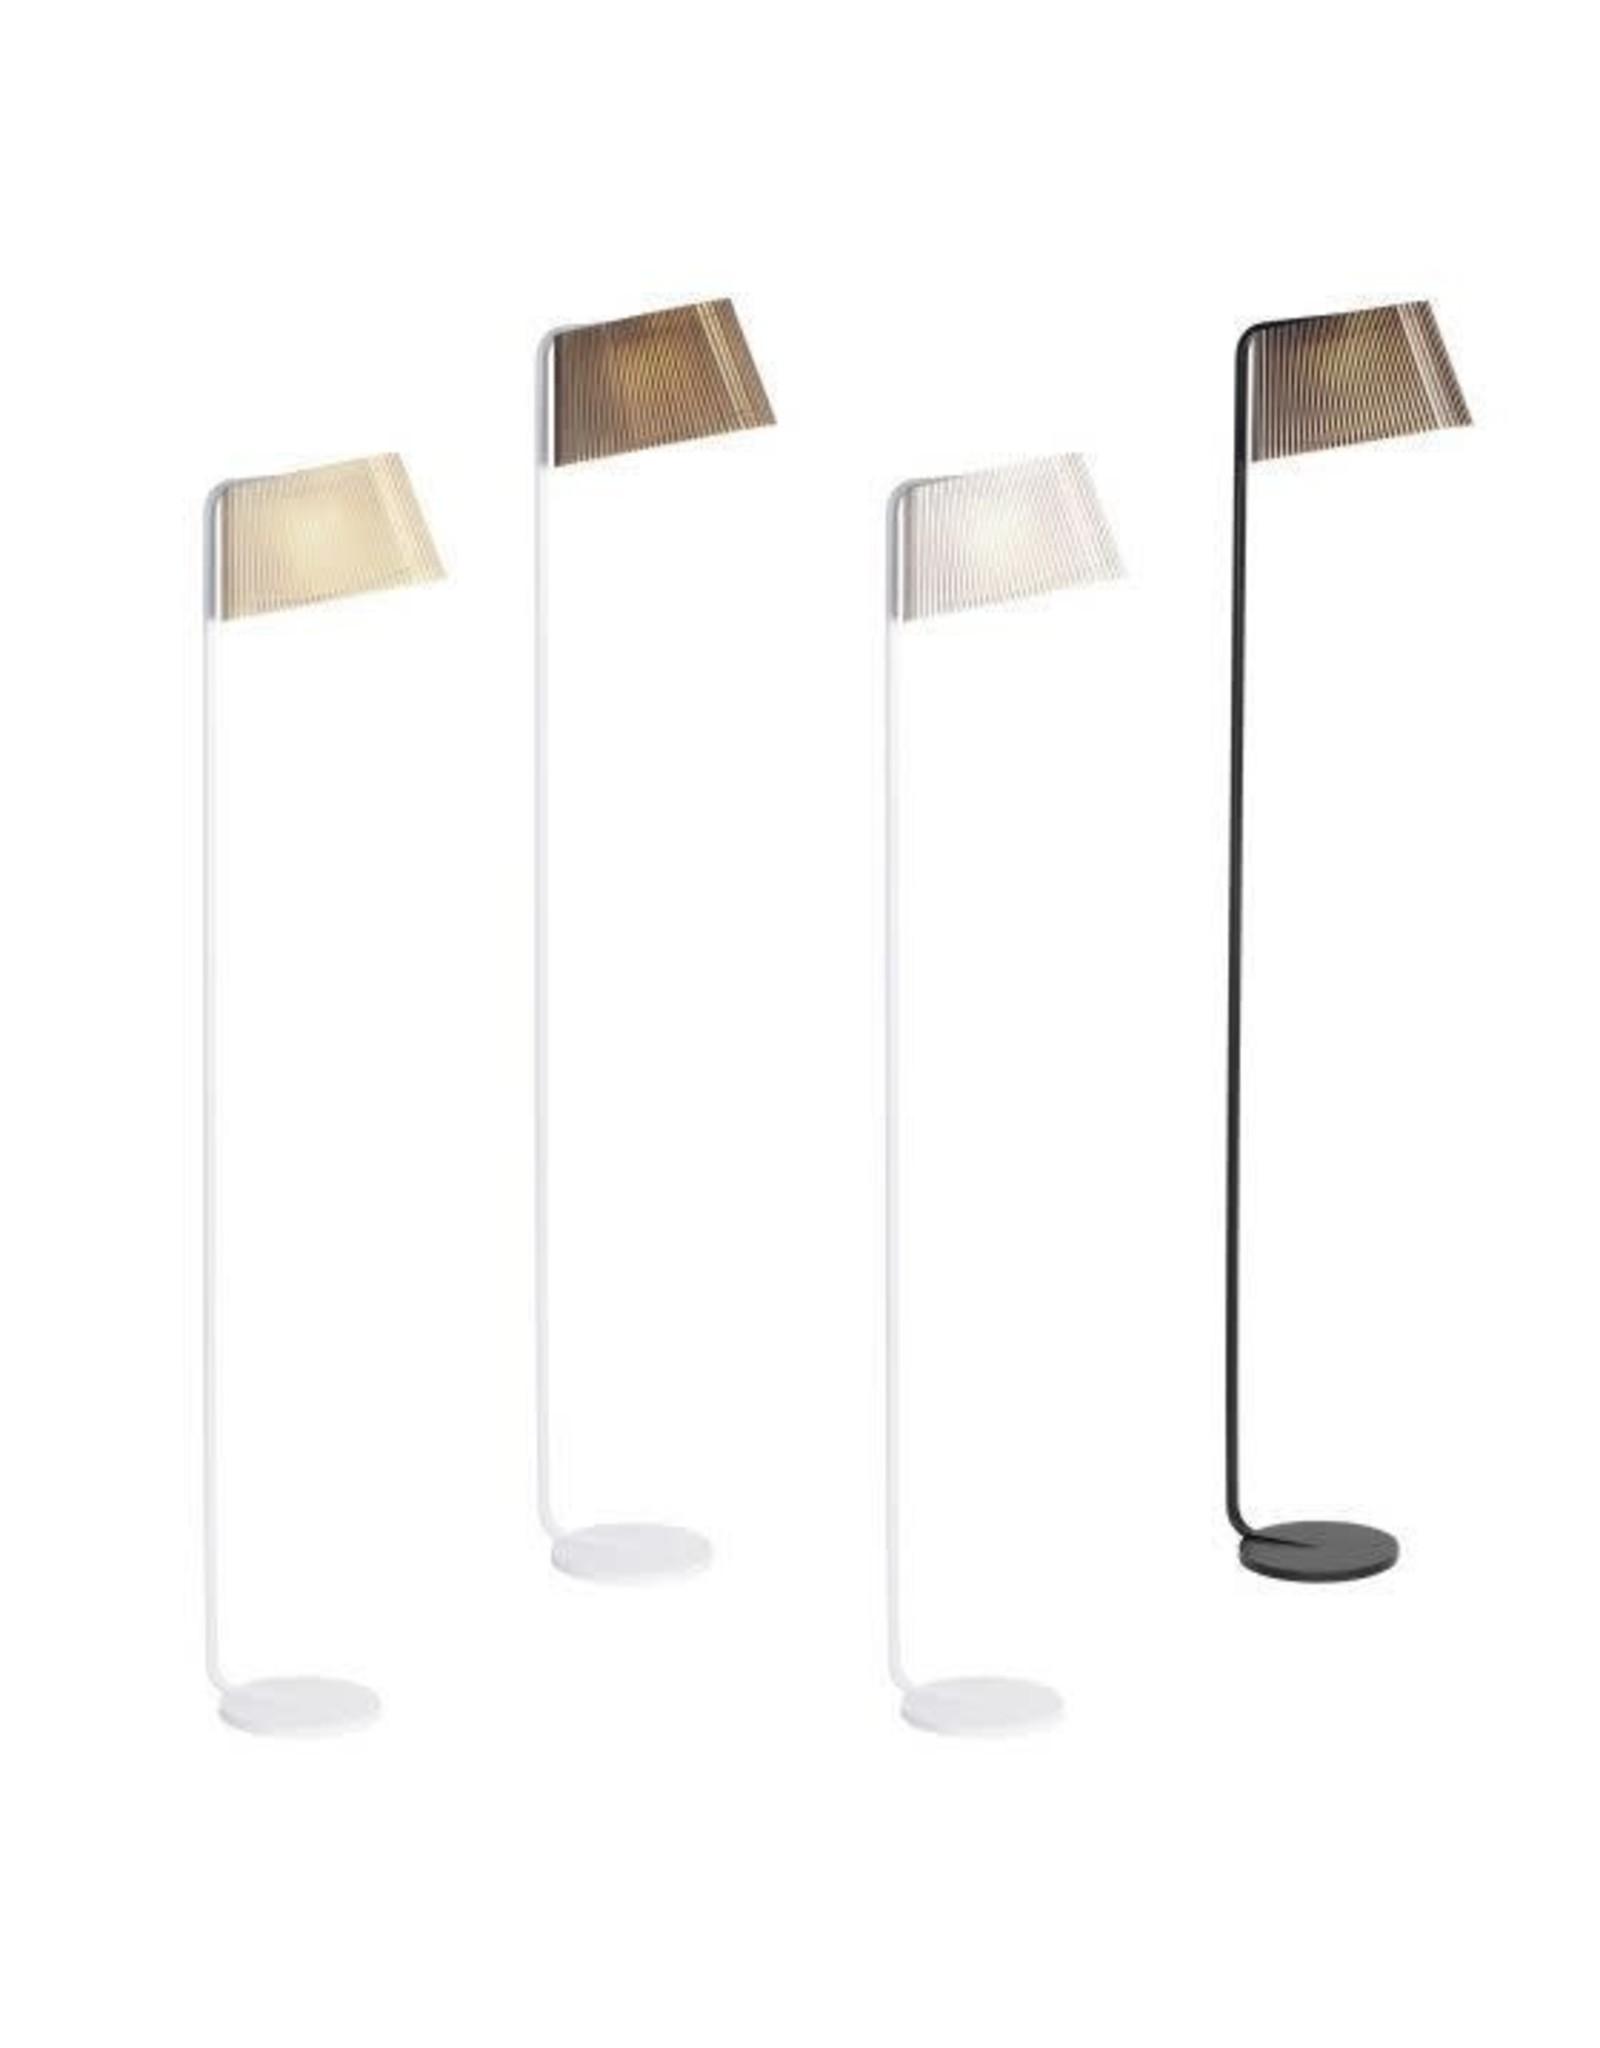 OWALO 7010 FLOOR LAMP